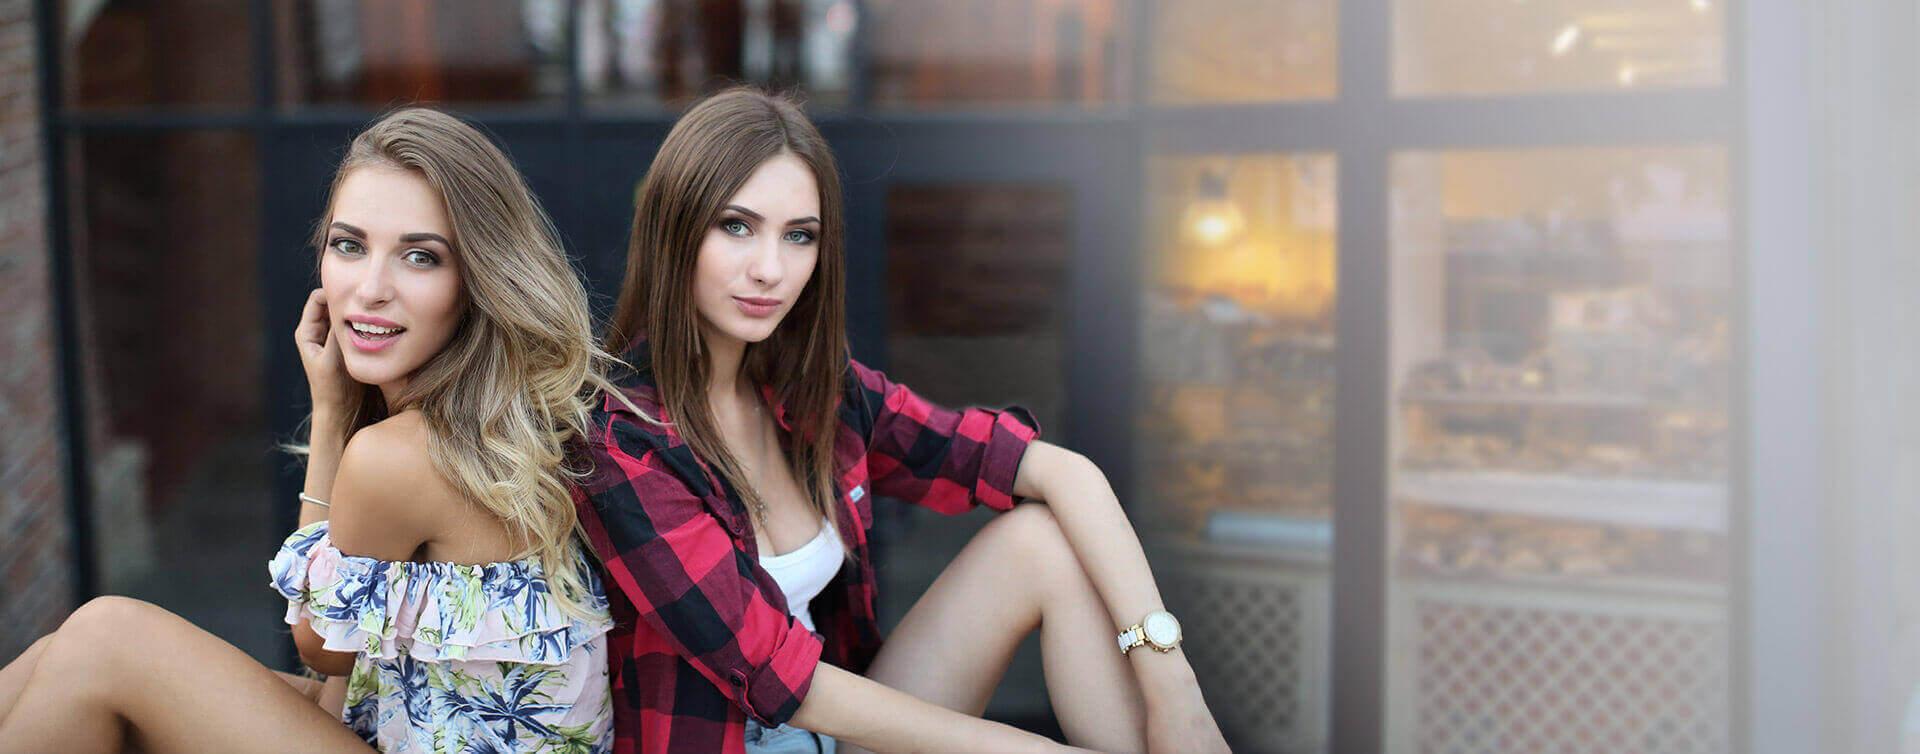 Youtube Ukrain Girls Search Browse